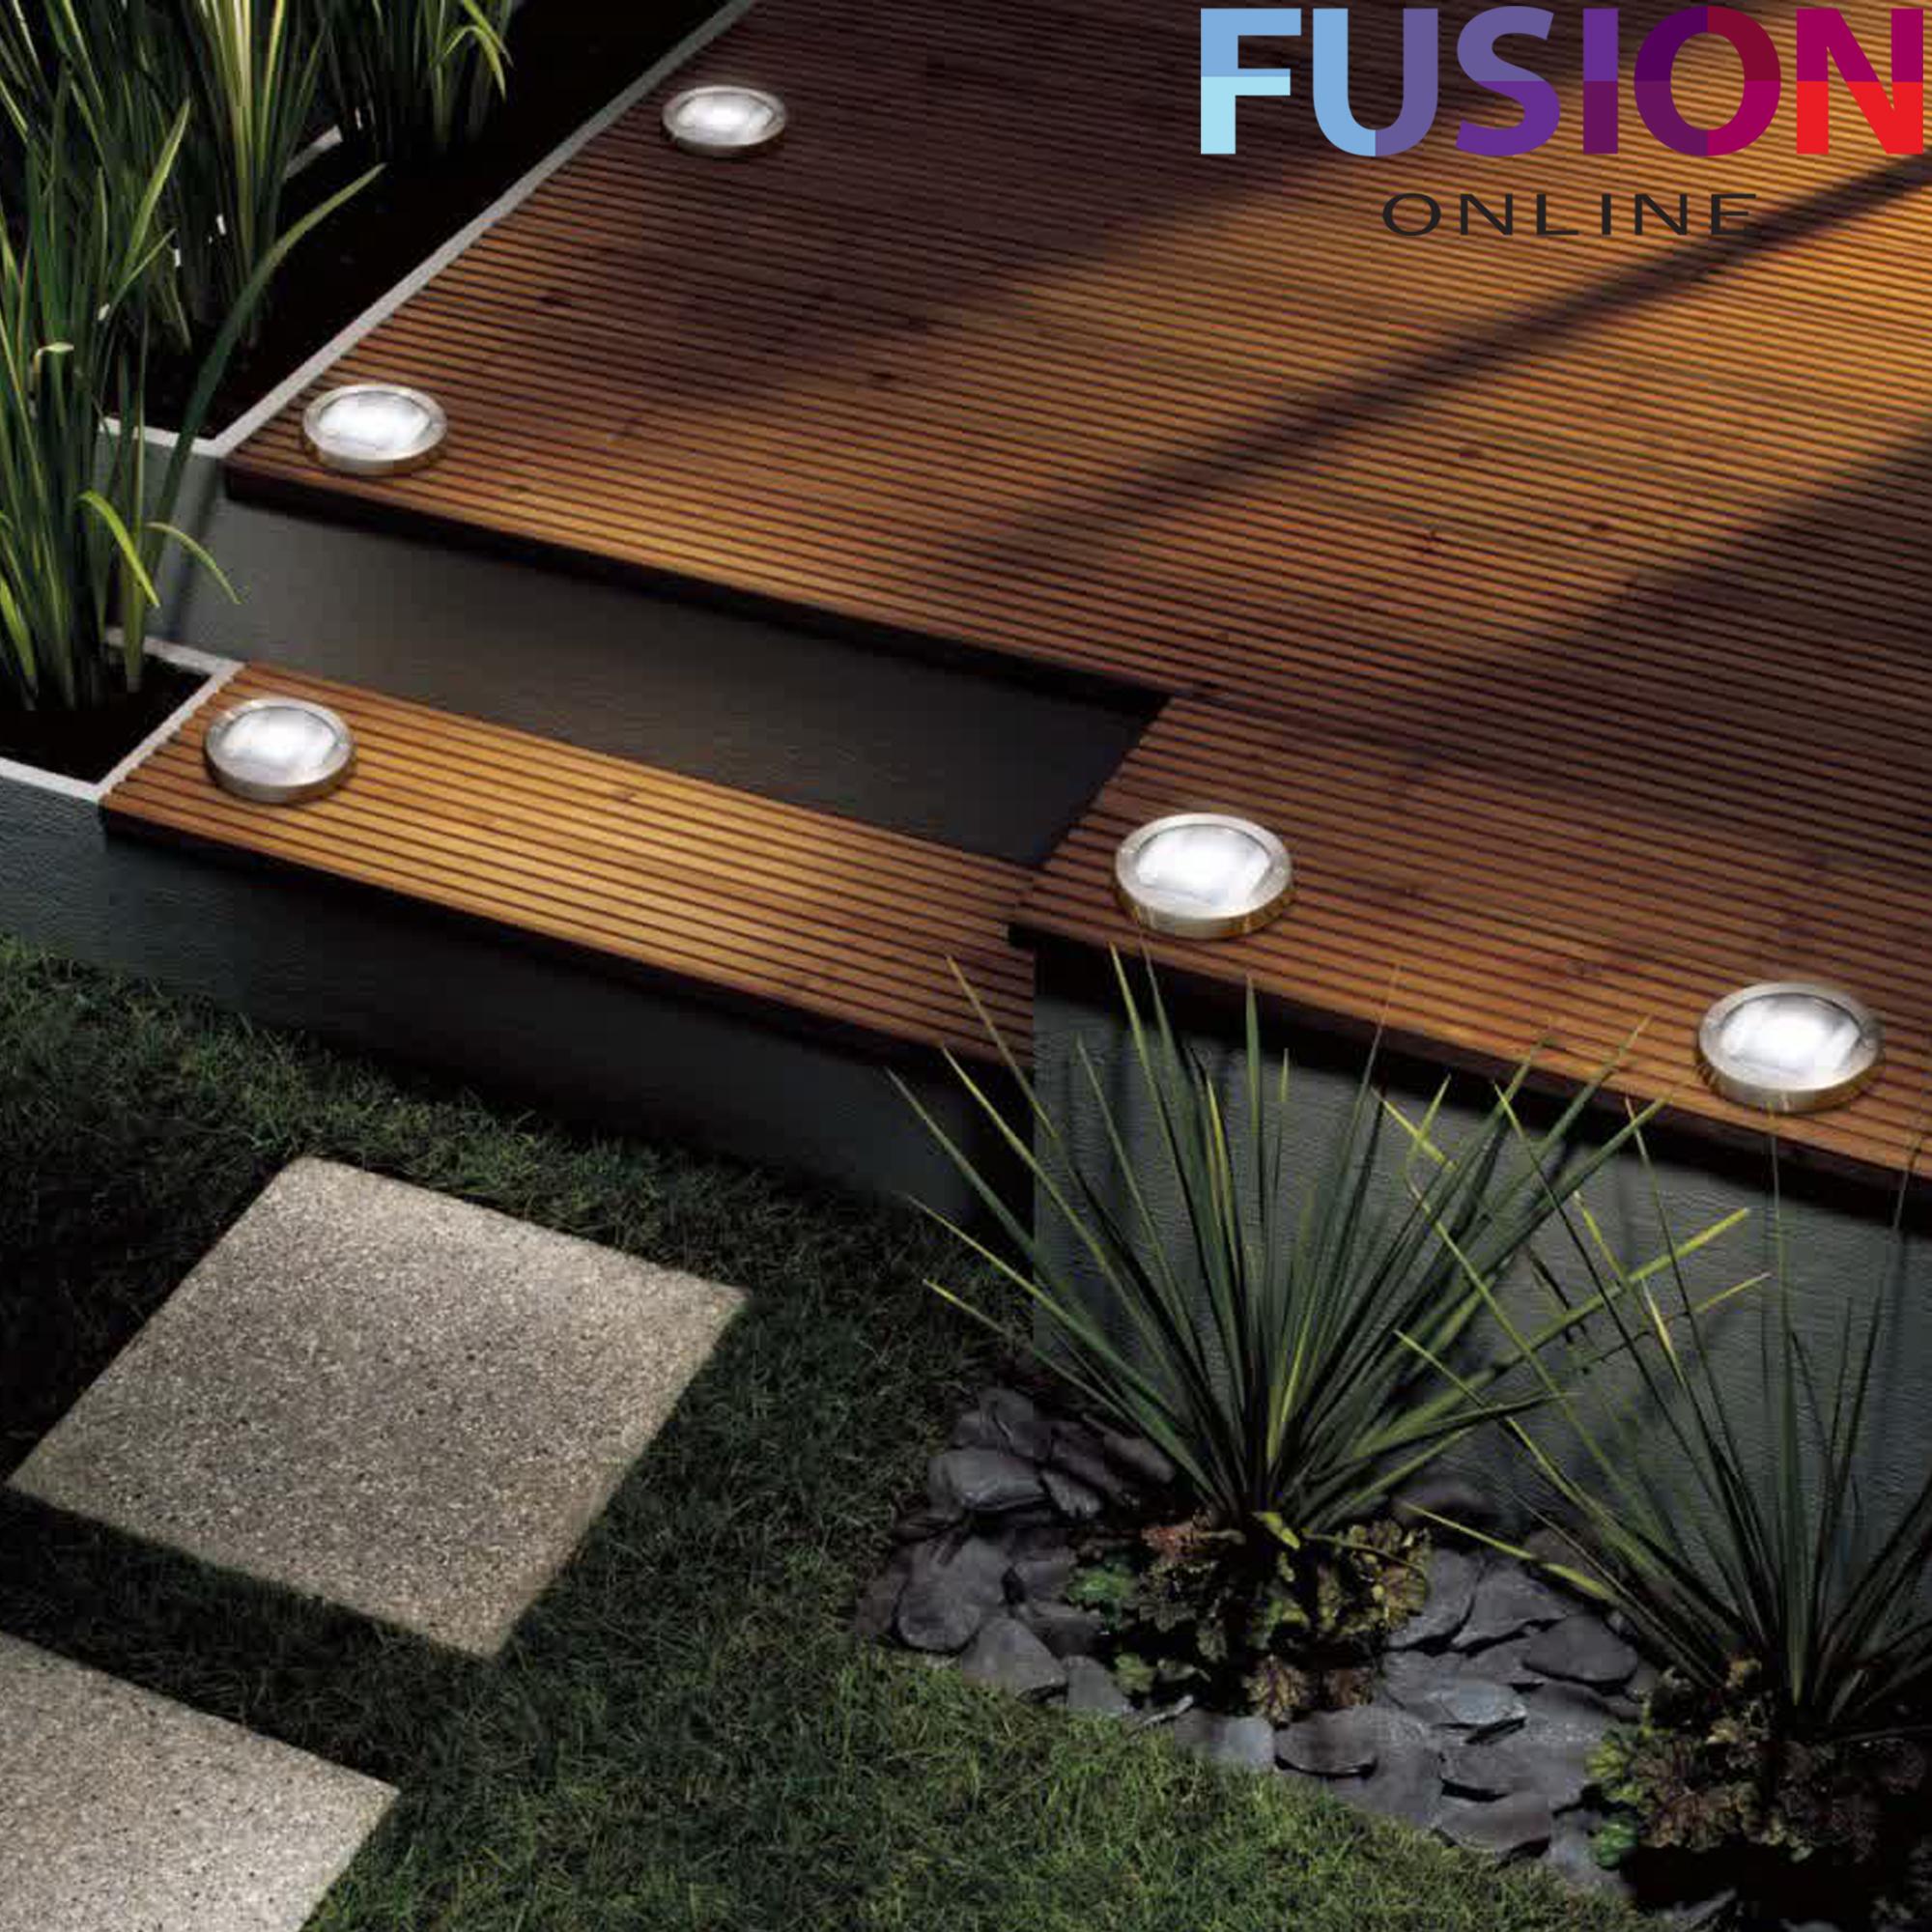 Led solar powered deck lights decking garden driveway for Garden decking lights uk